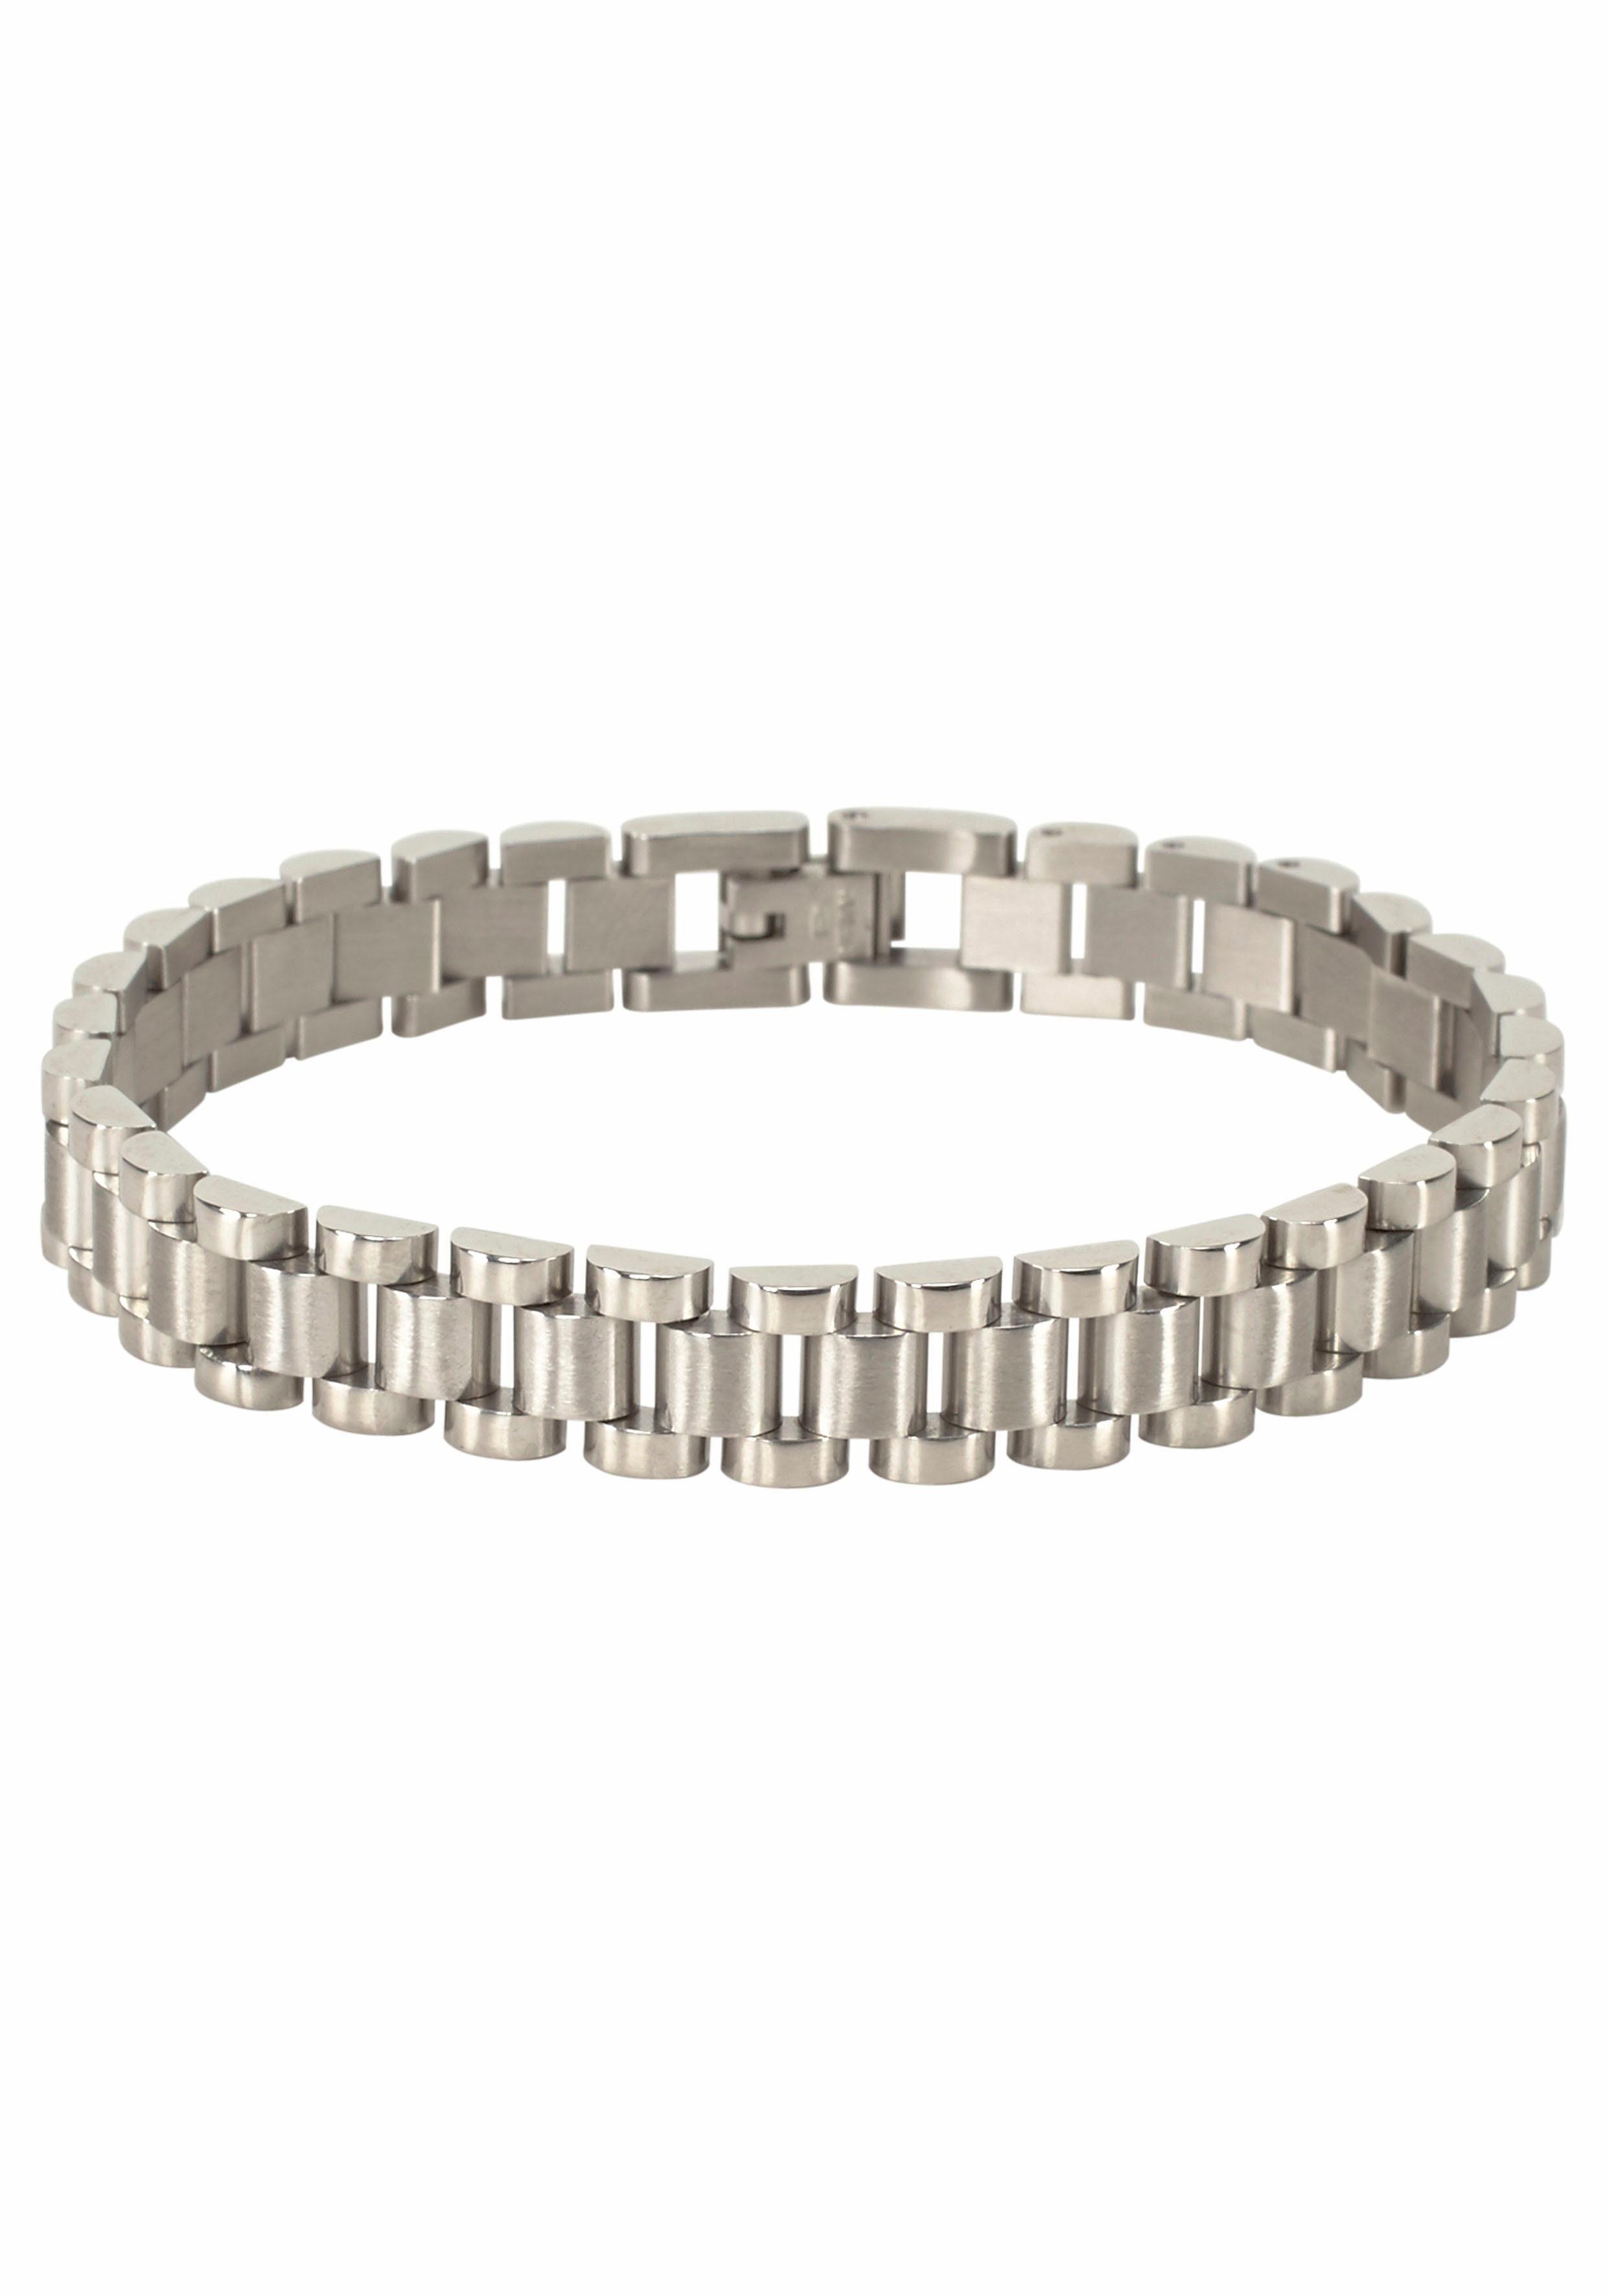 J.Jayz Armband im eleganten Design, Edelstahl